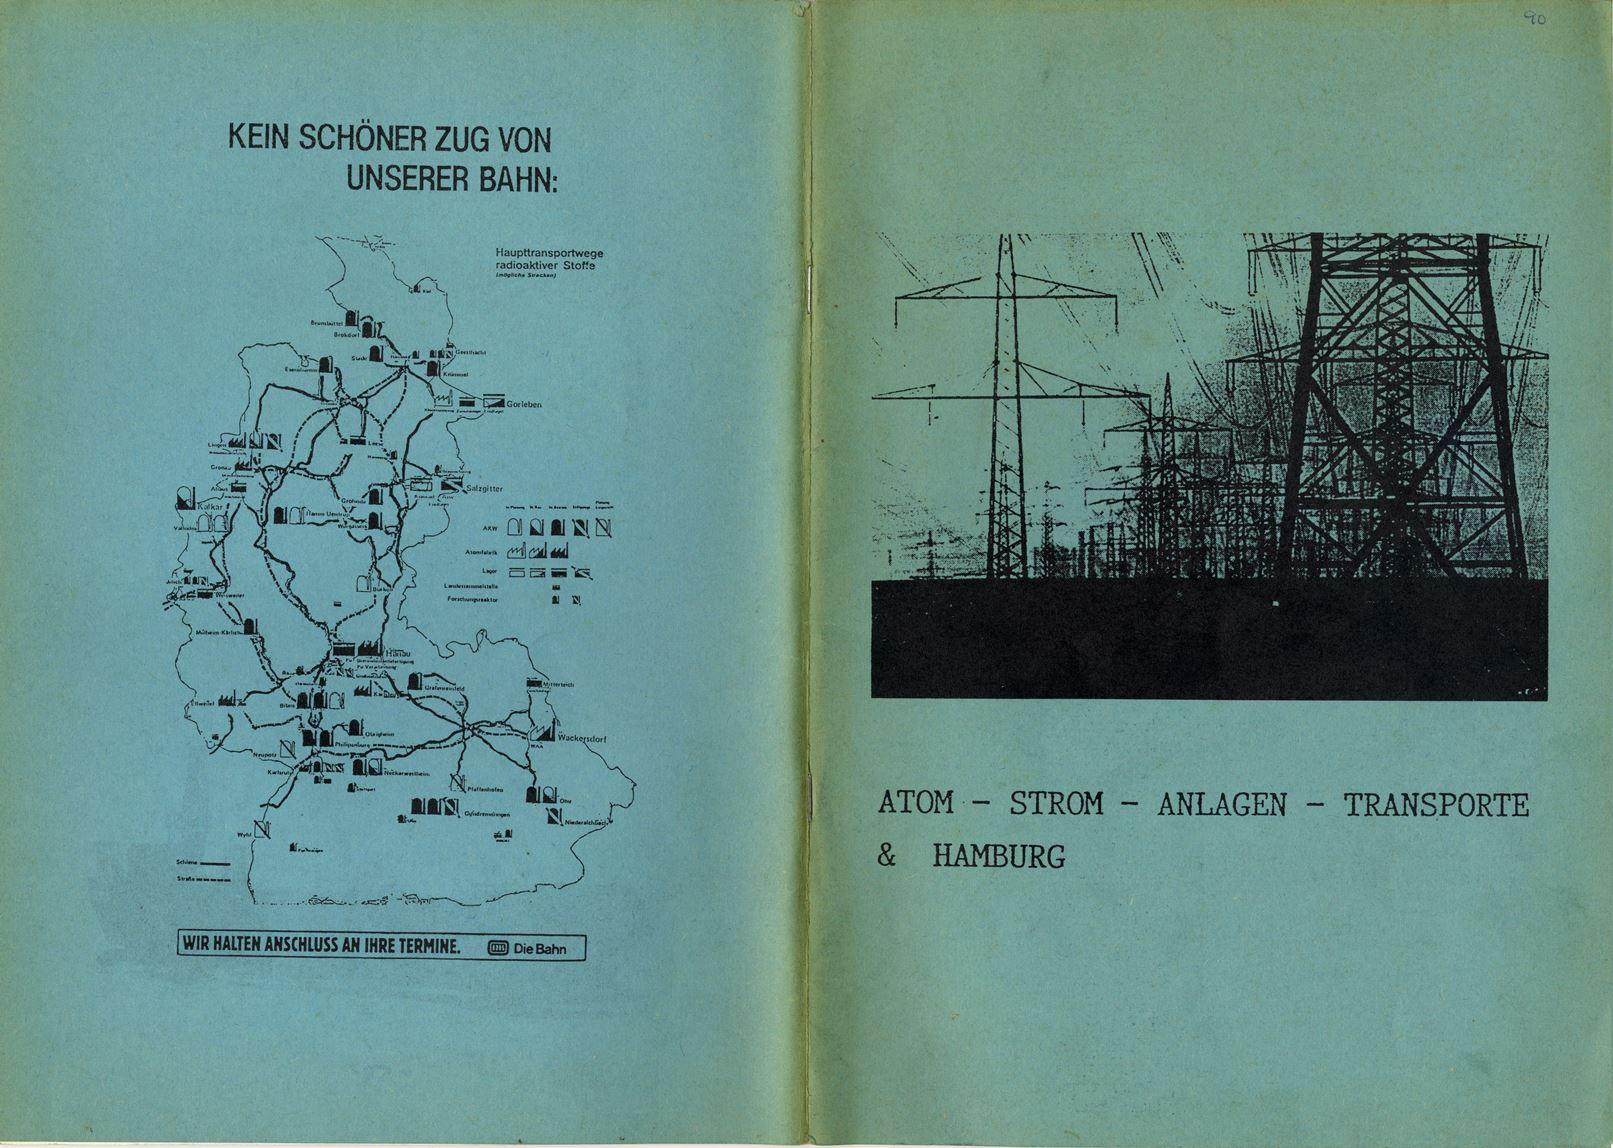 Hamburg_Atomtransporte_19900200_001